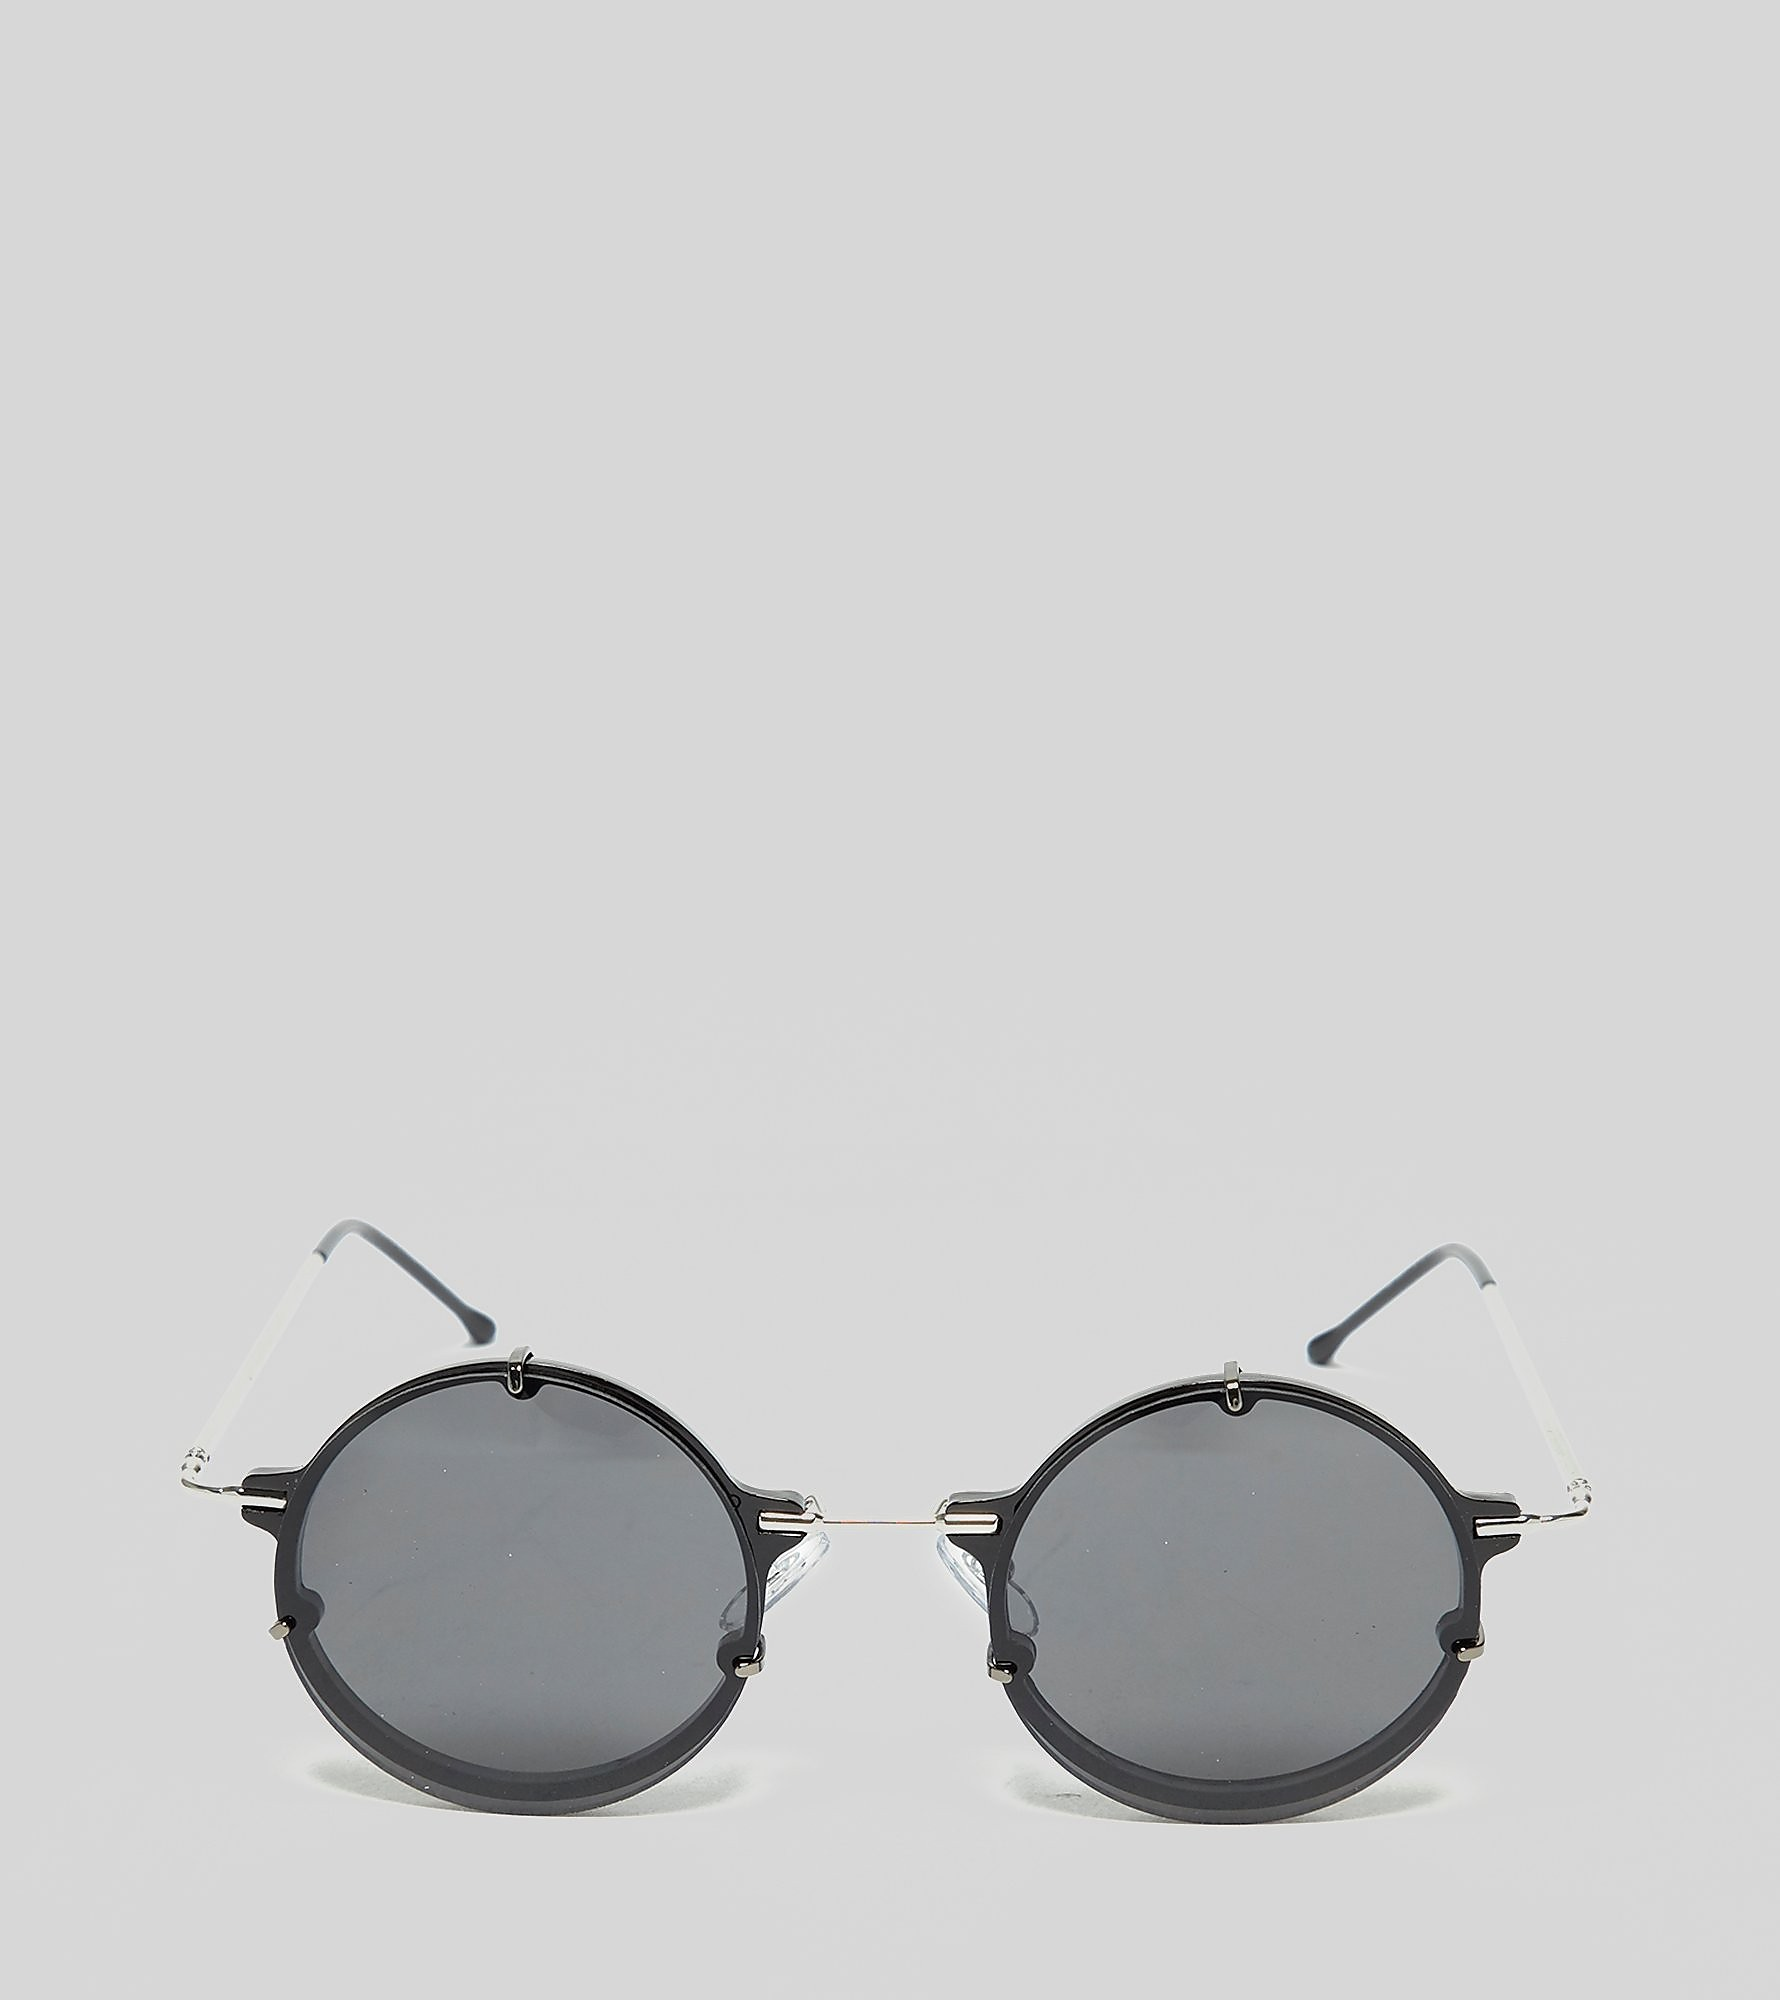 Spitfire Infinity Sunglasses